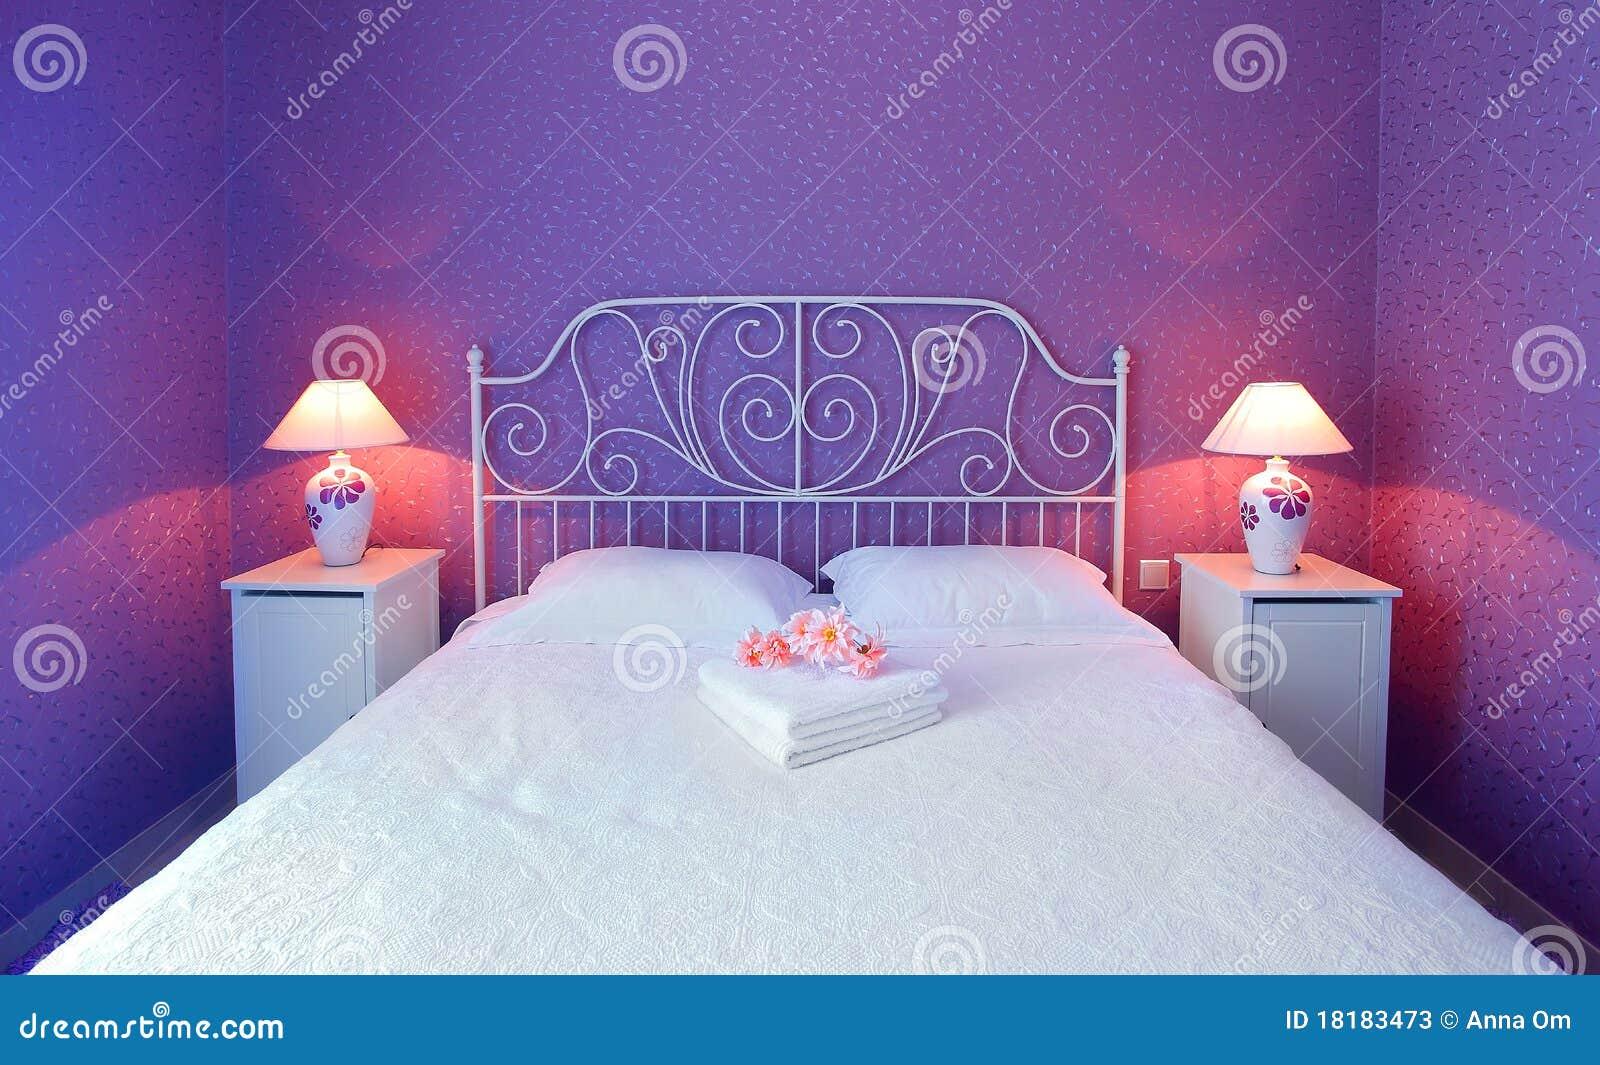 Romantic bedroom stock image Image of decorative